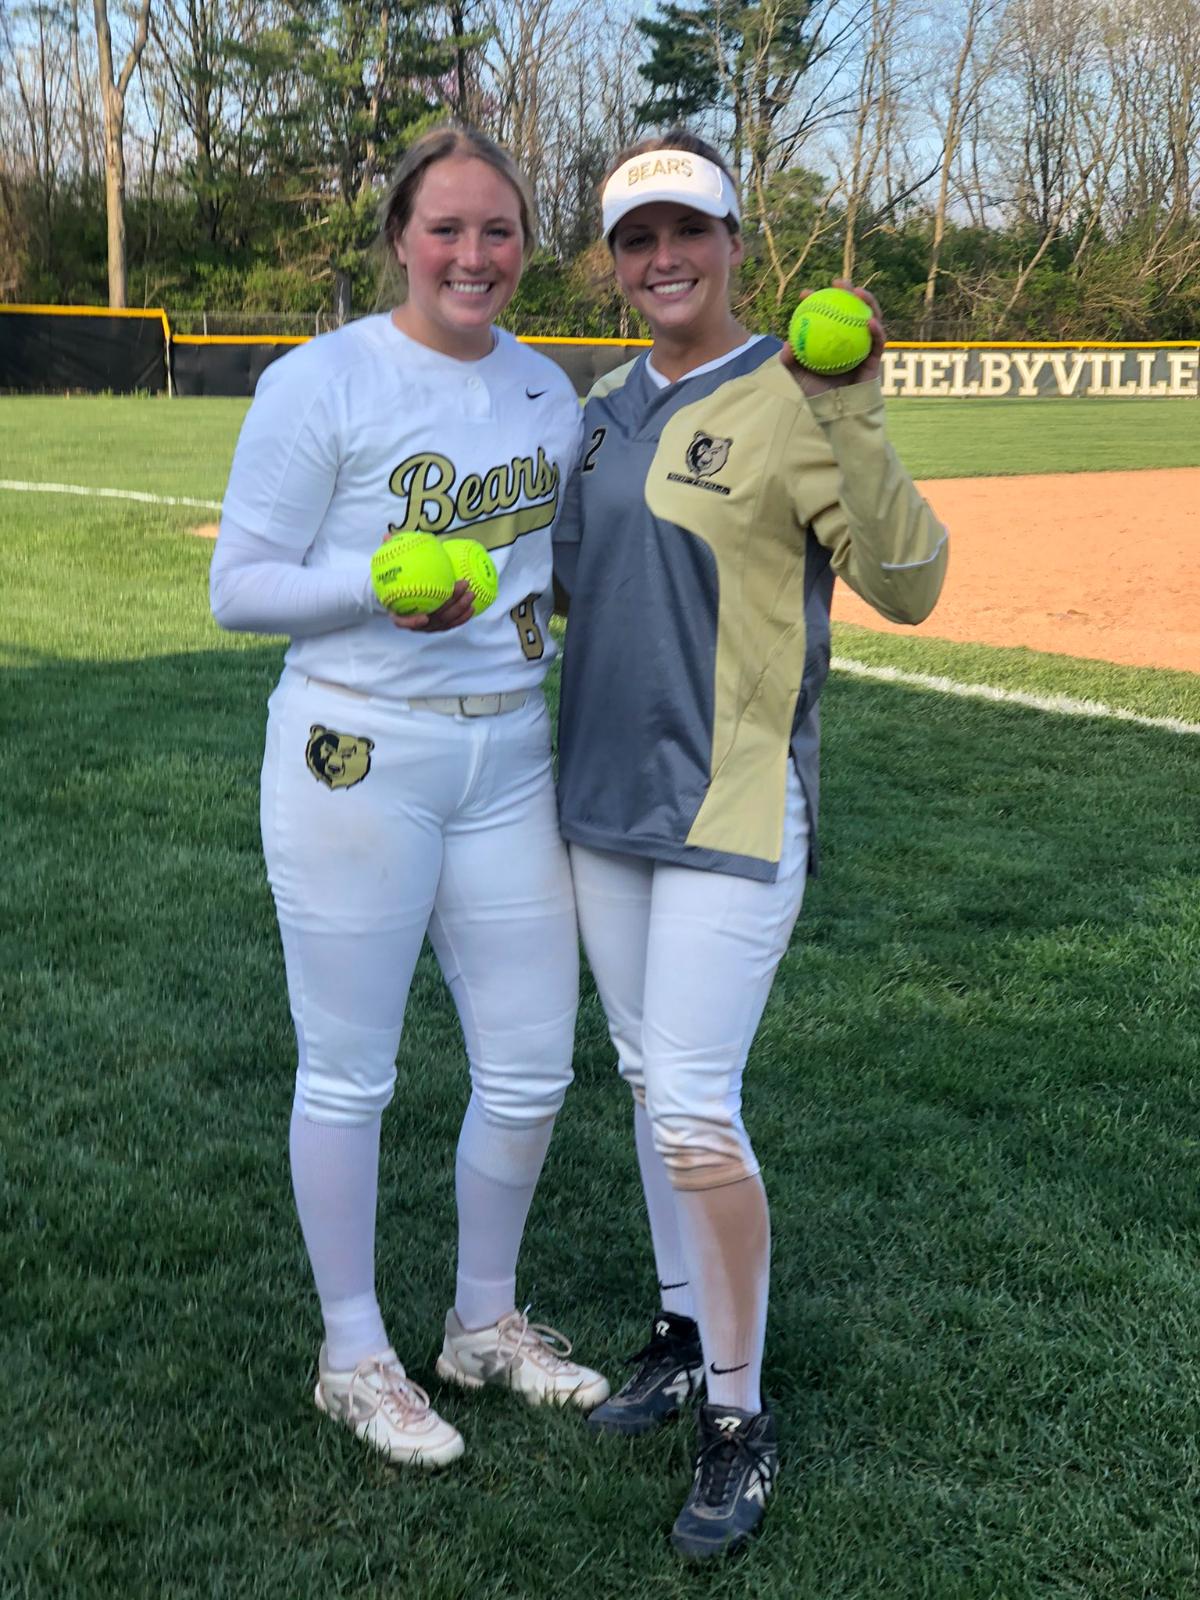 Softball Home Runs vs. Pendleton Heights and Rushville